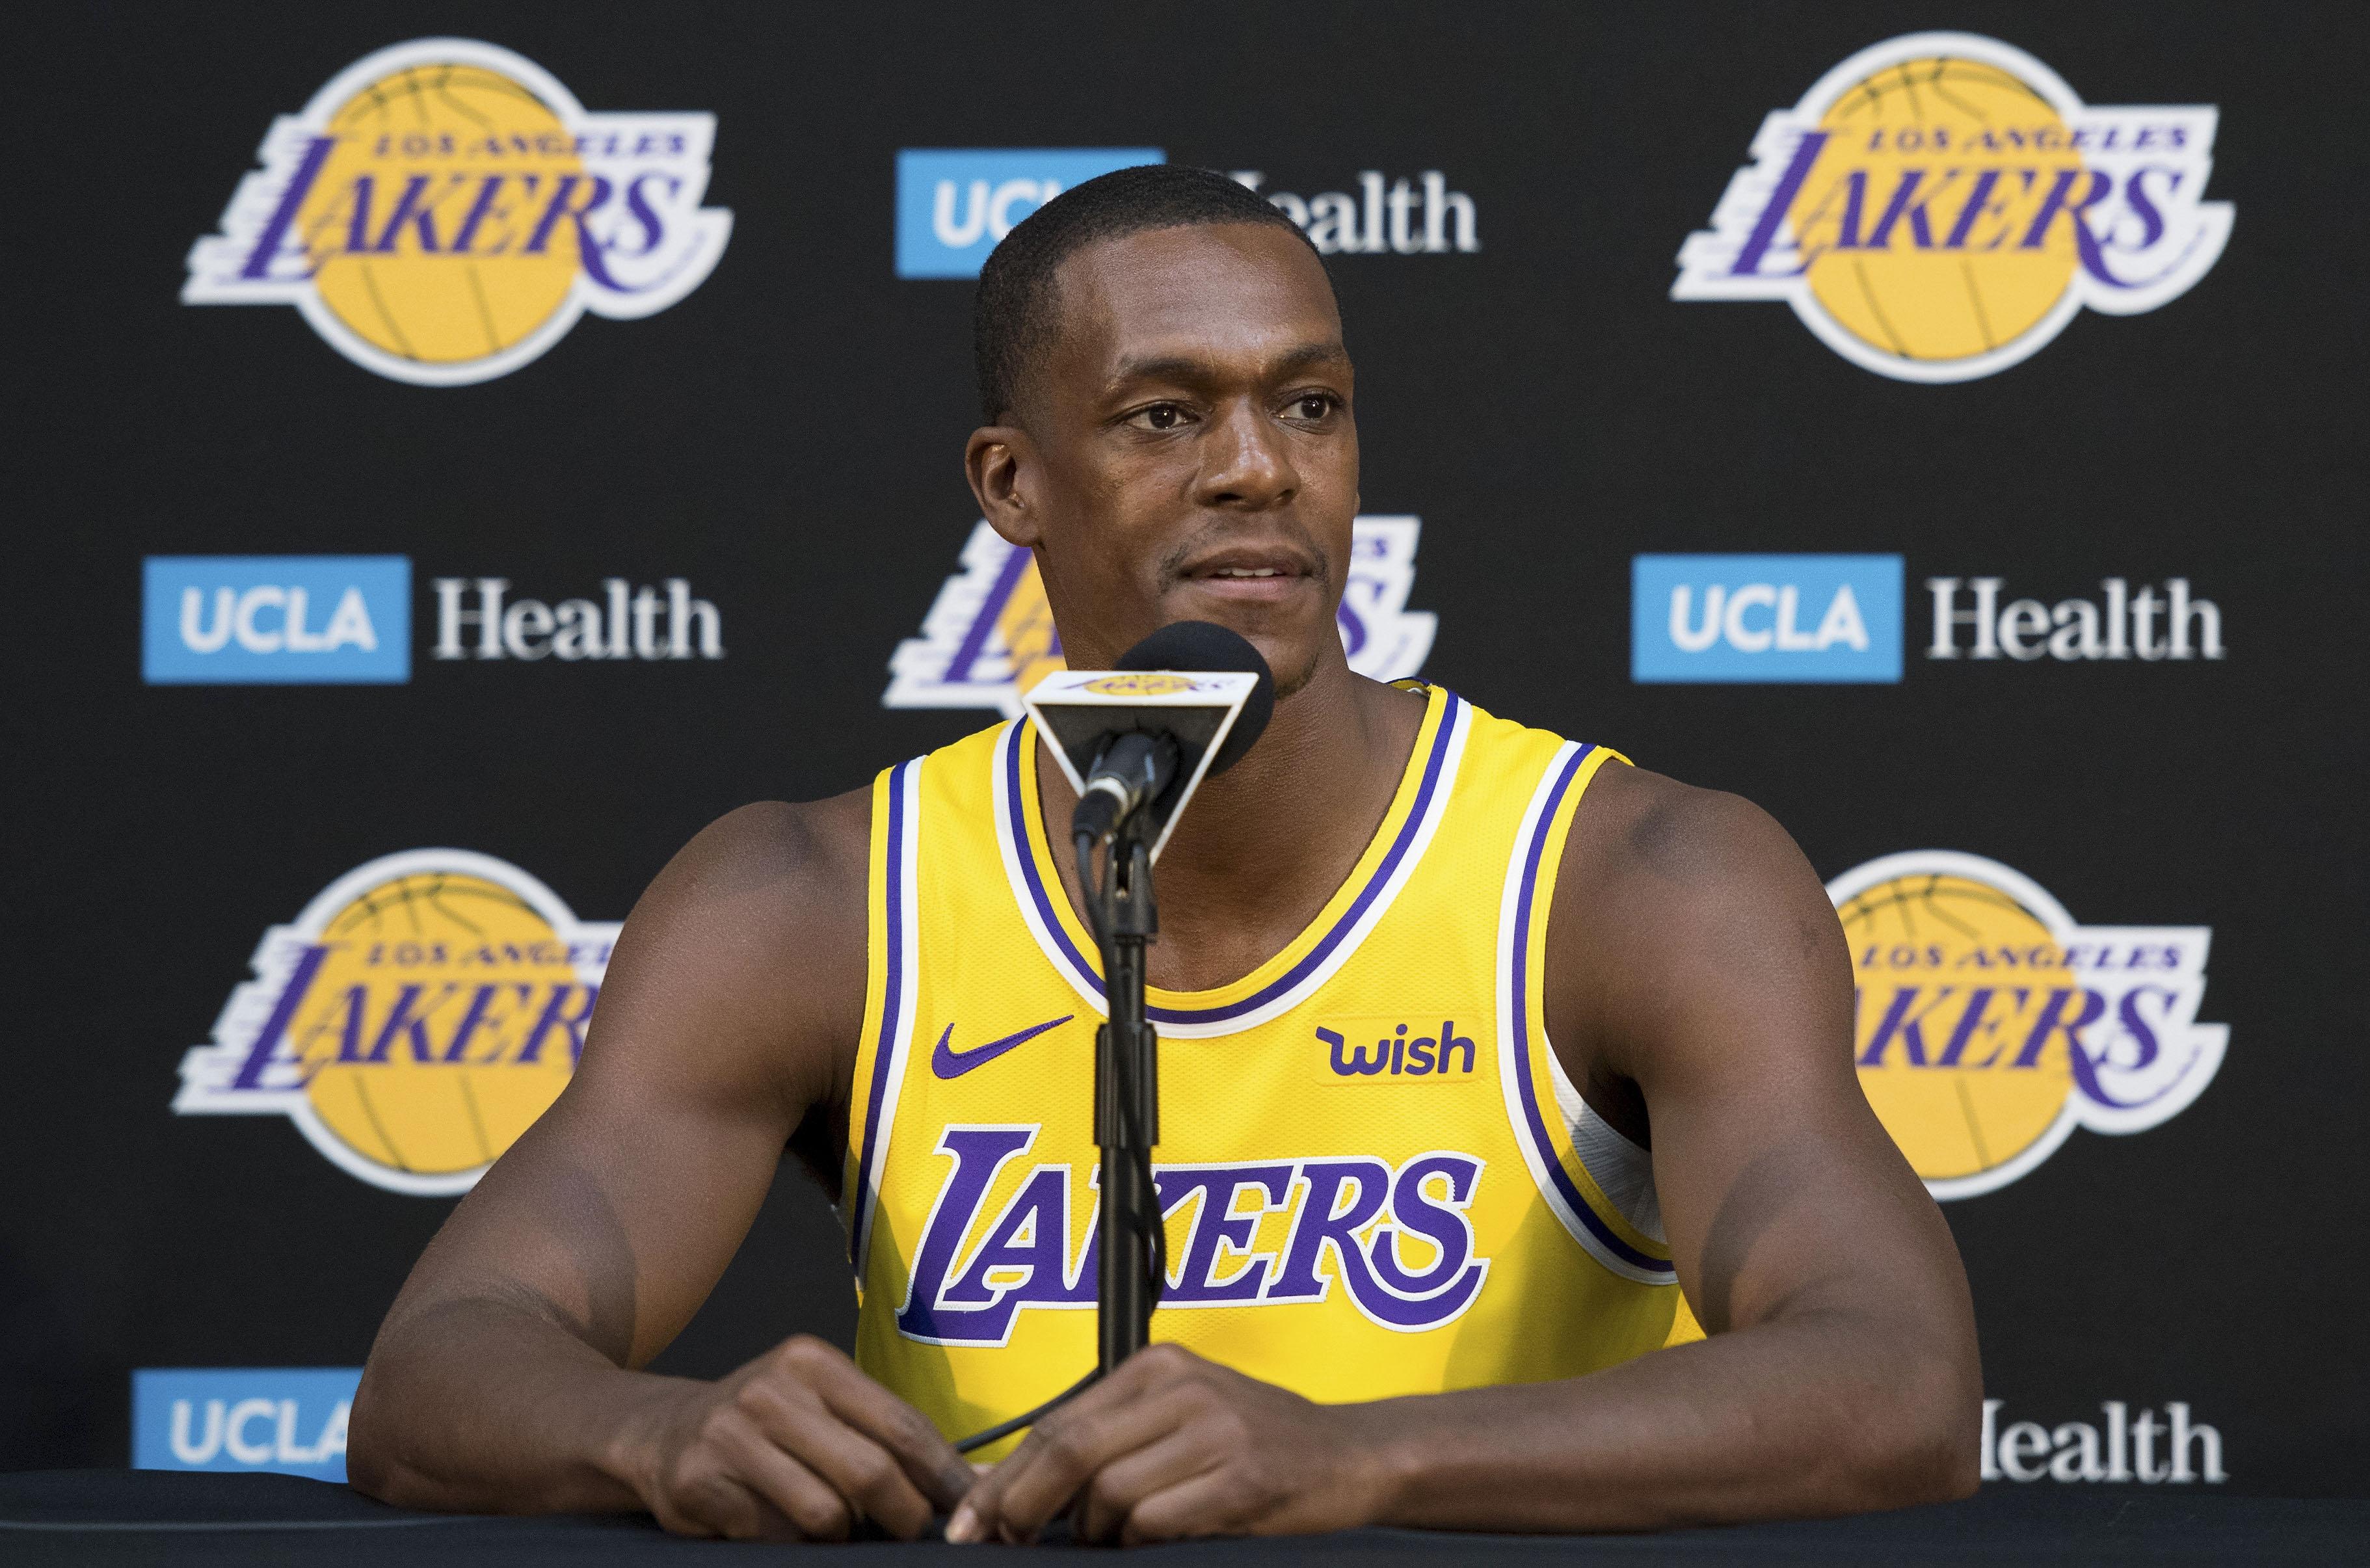 Lakers will start Rajon Rondo to begin the 2018-19 season